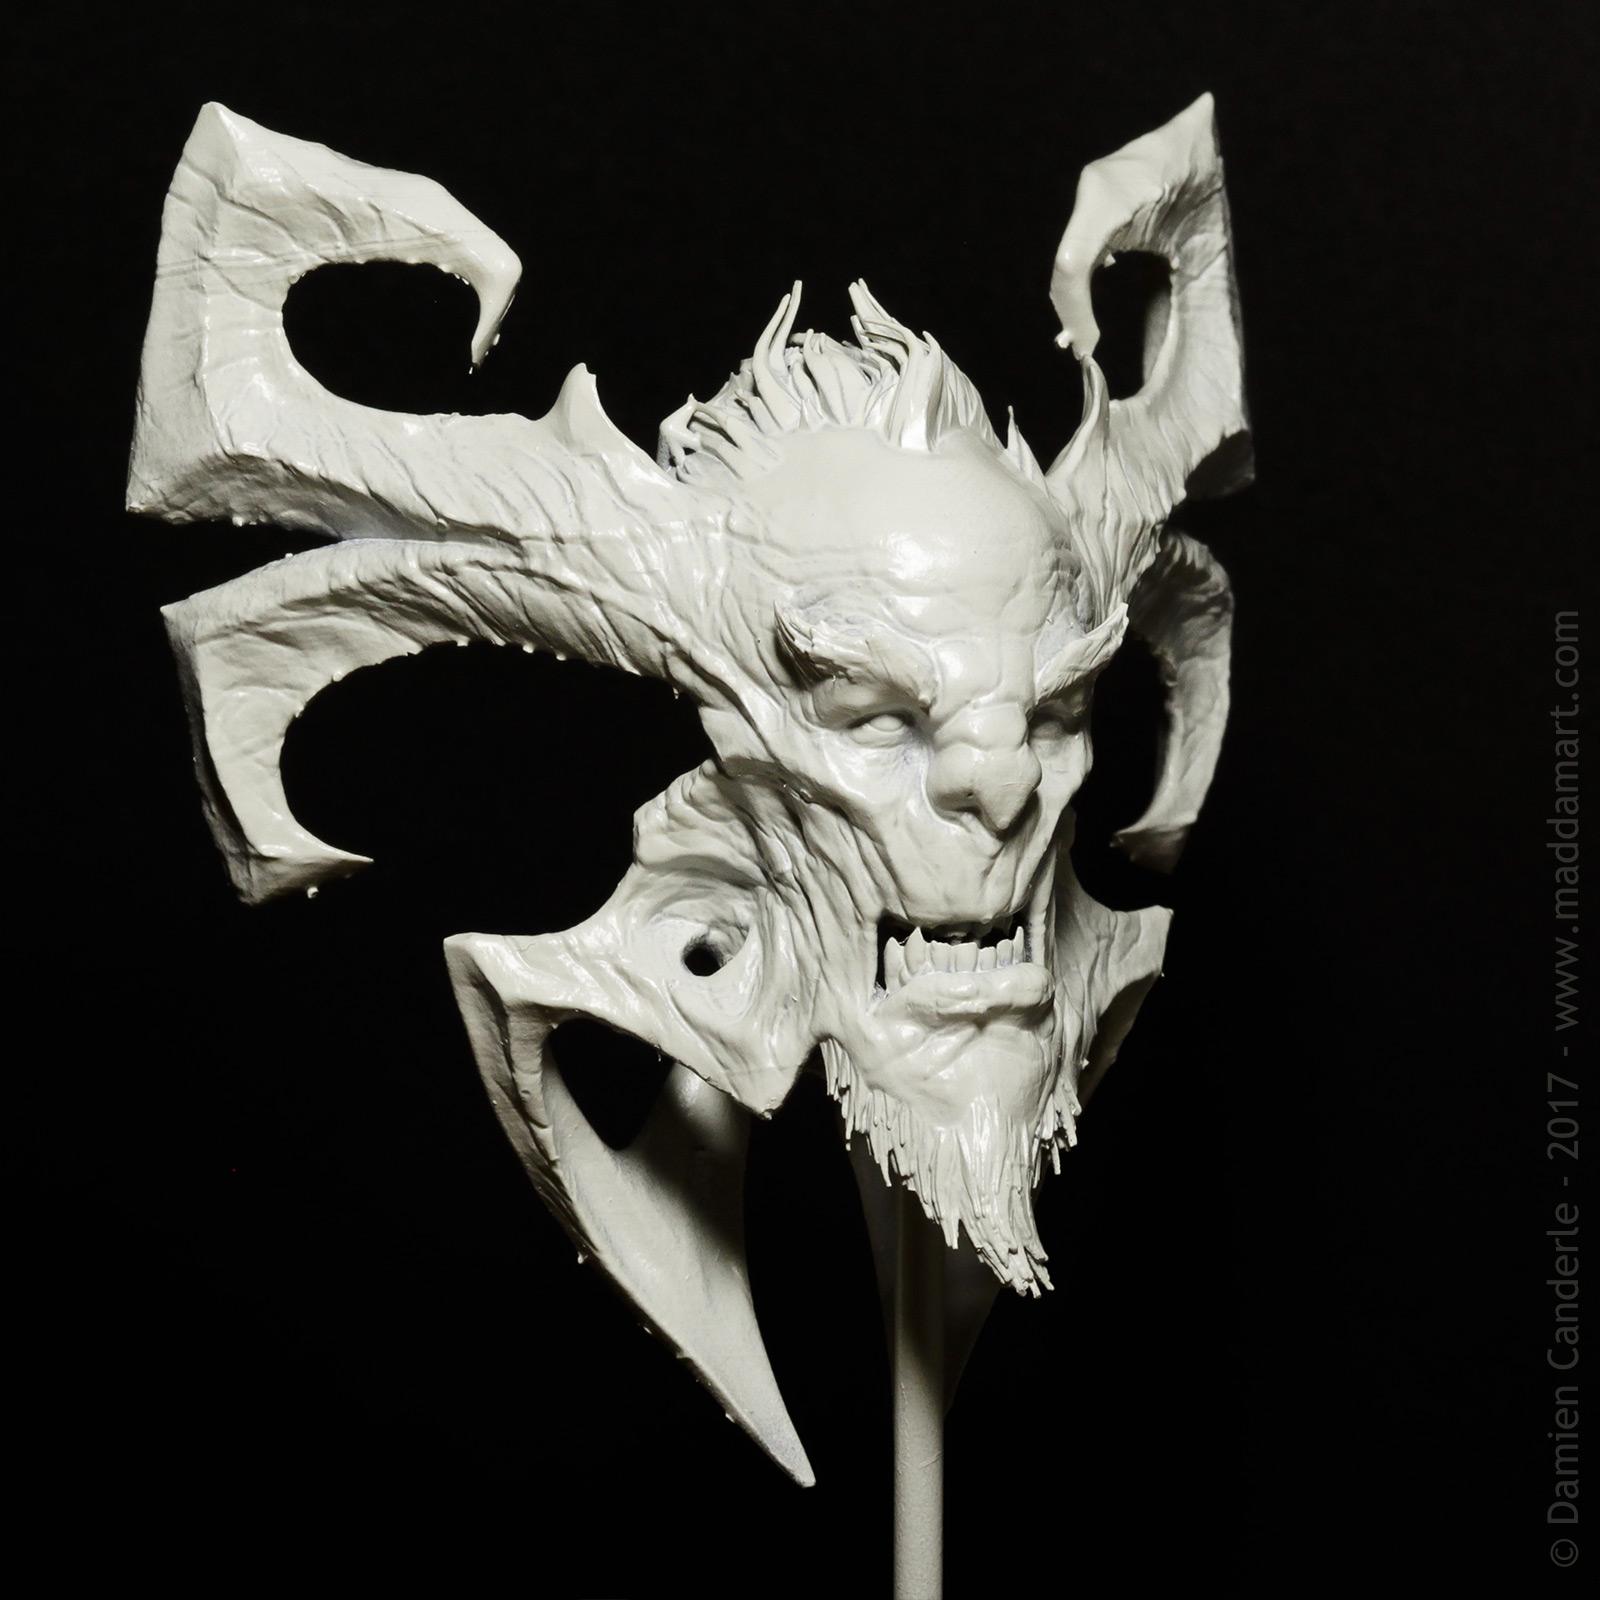 Damien_Canderle_Demon_03